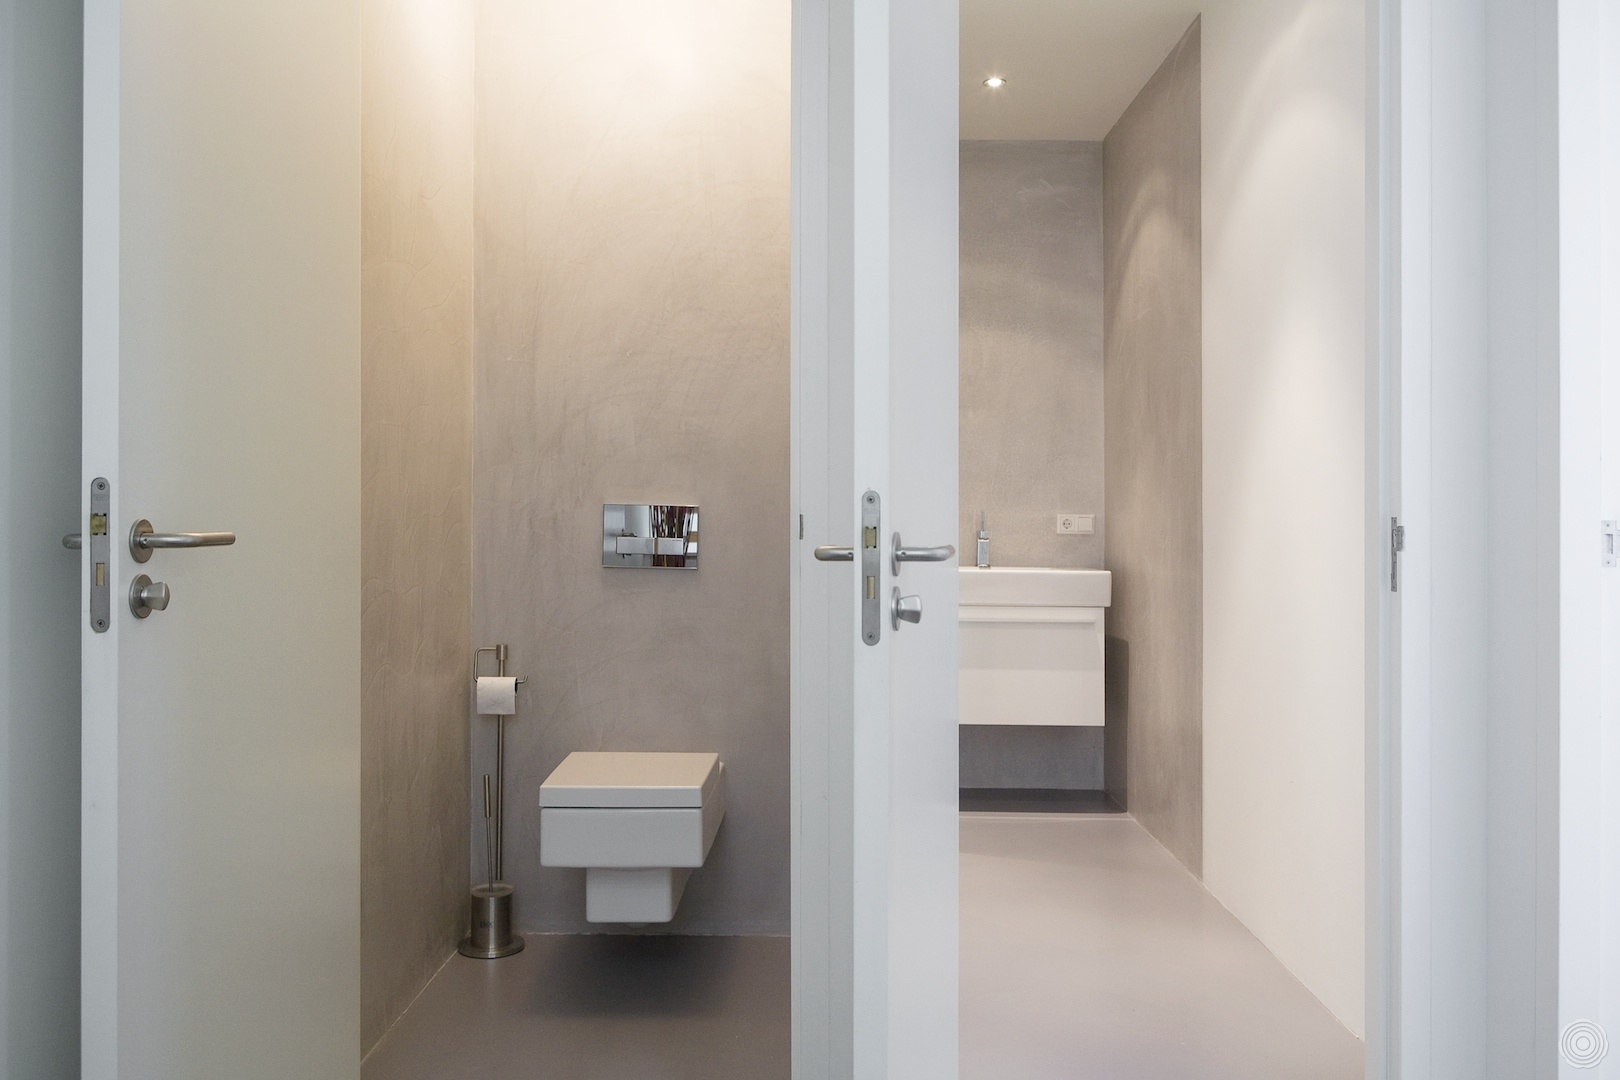 SENSO | Gietvloeren badkamers | SENSO Gietvloer